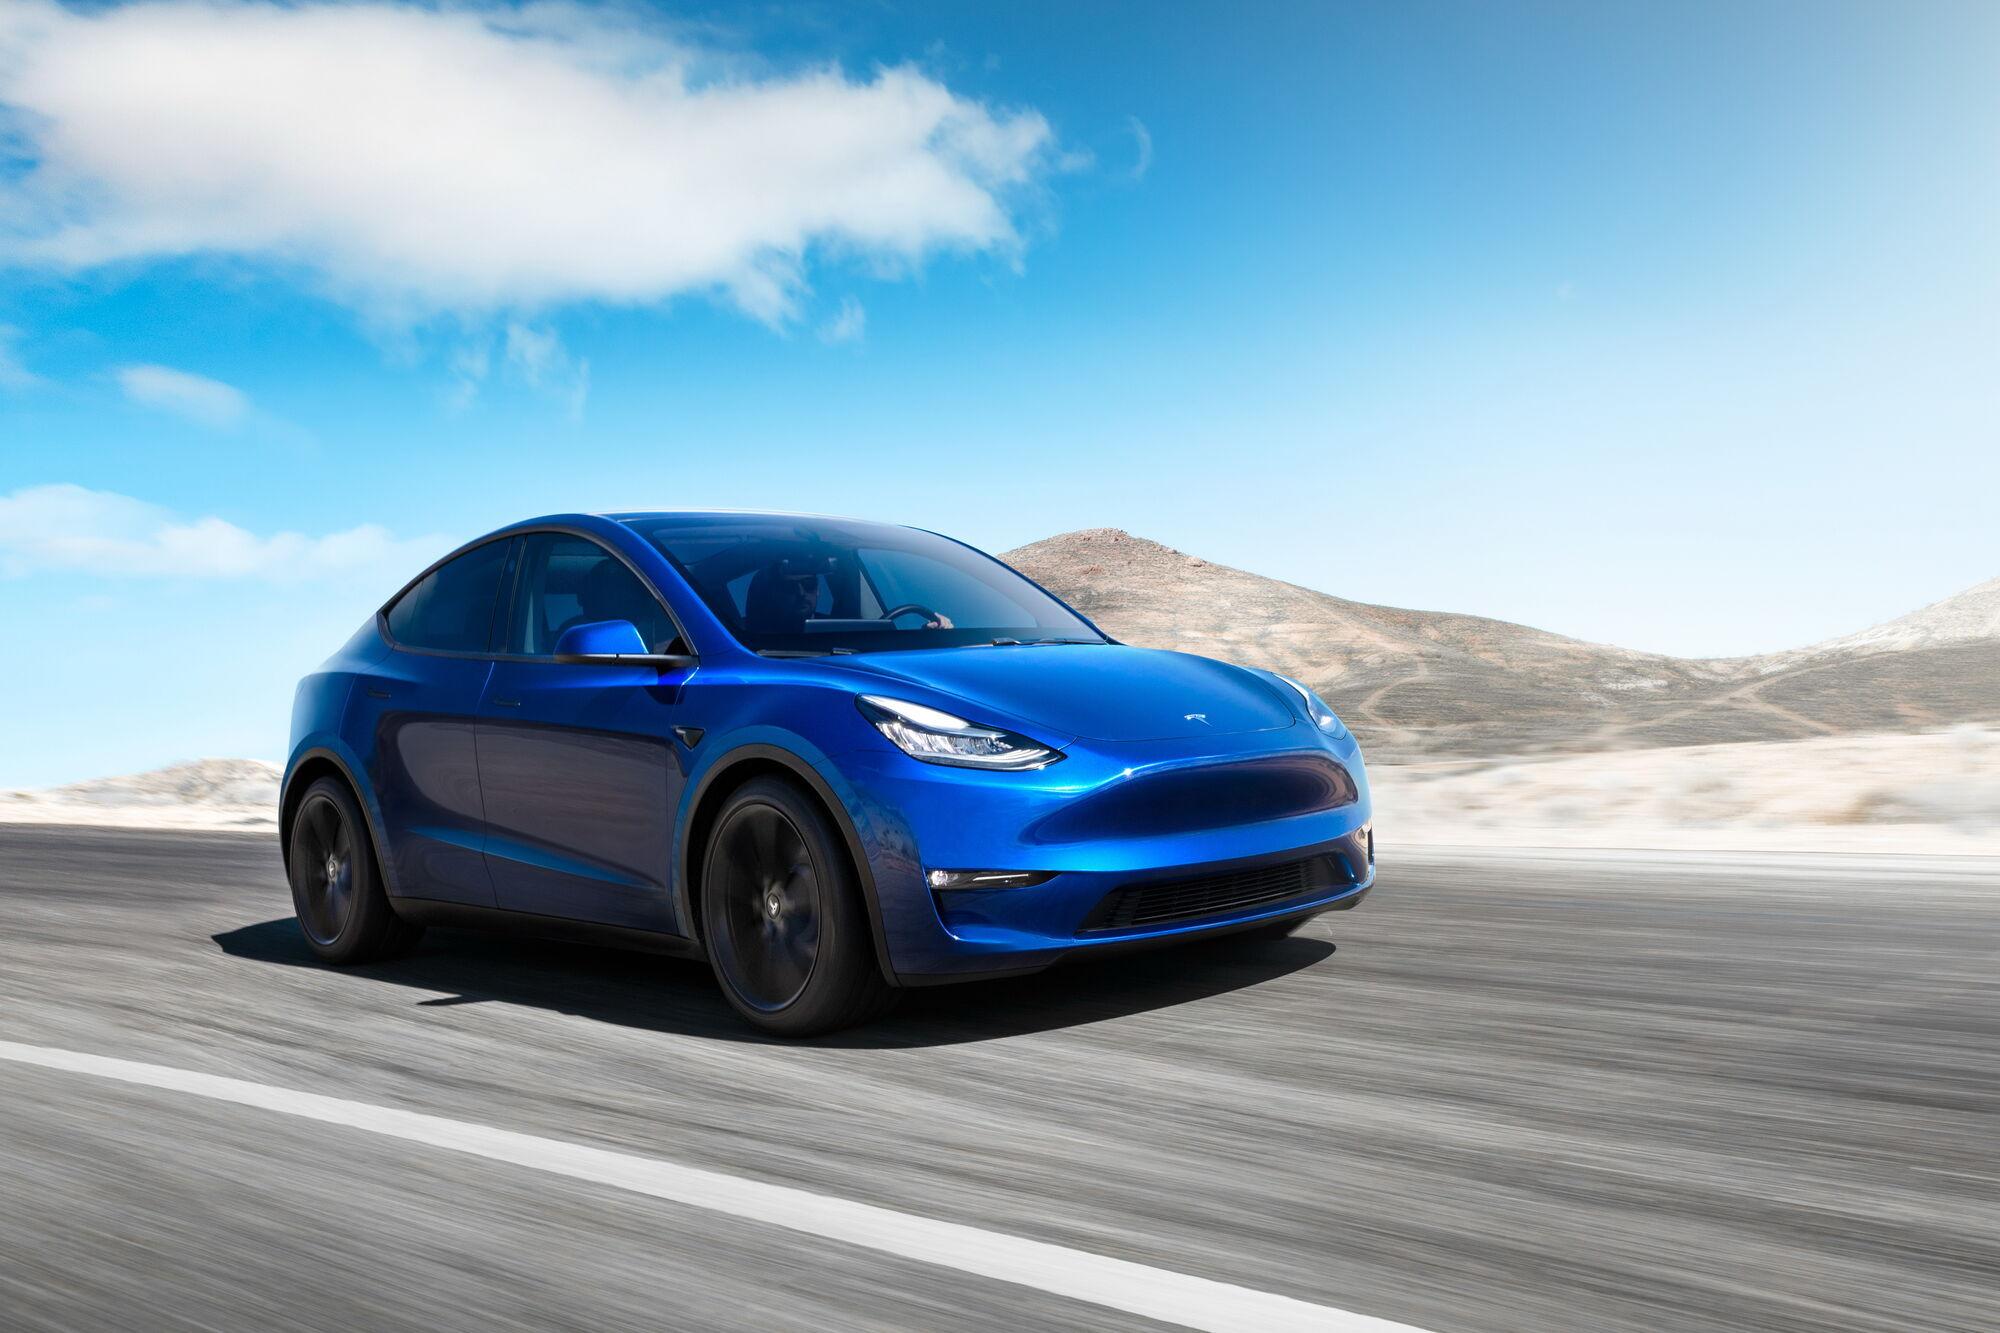 Tesla Model Y презентували весною 2019 року